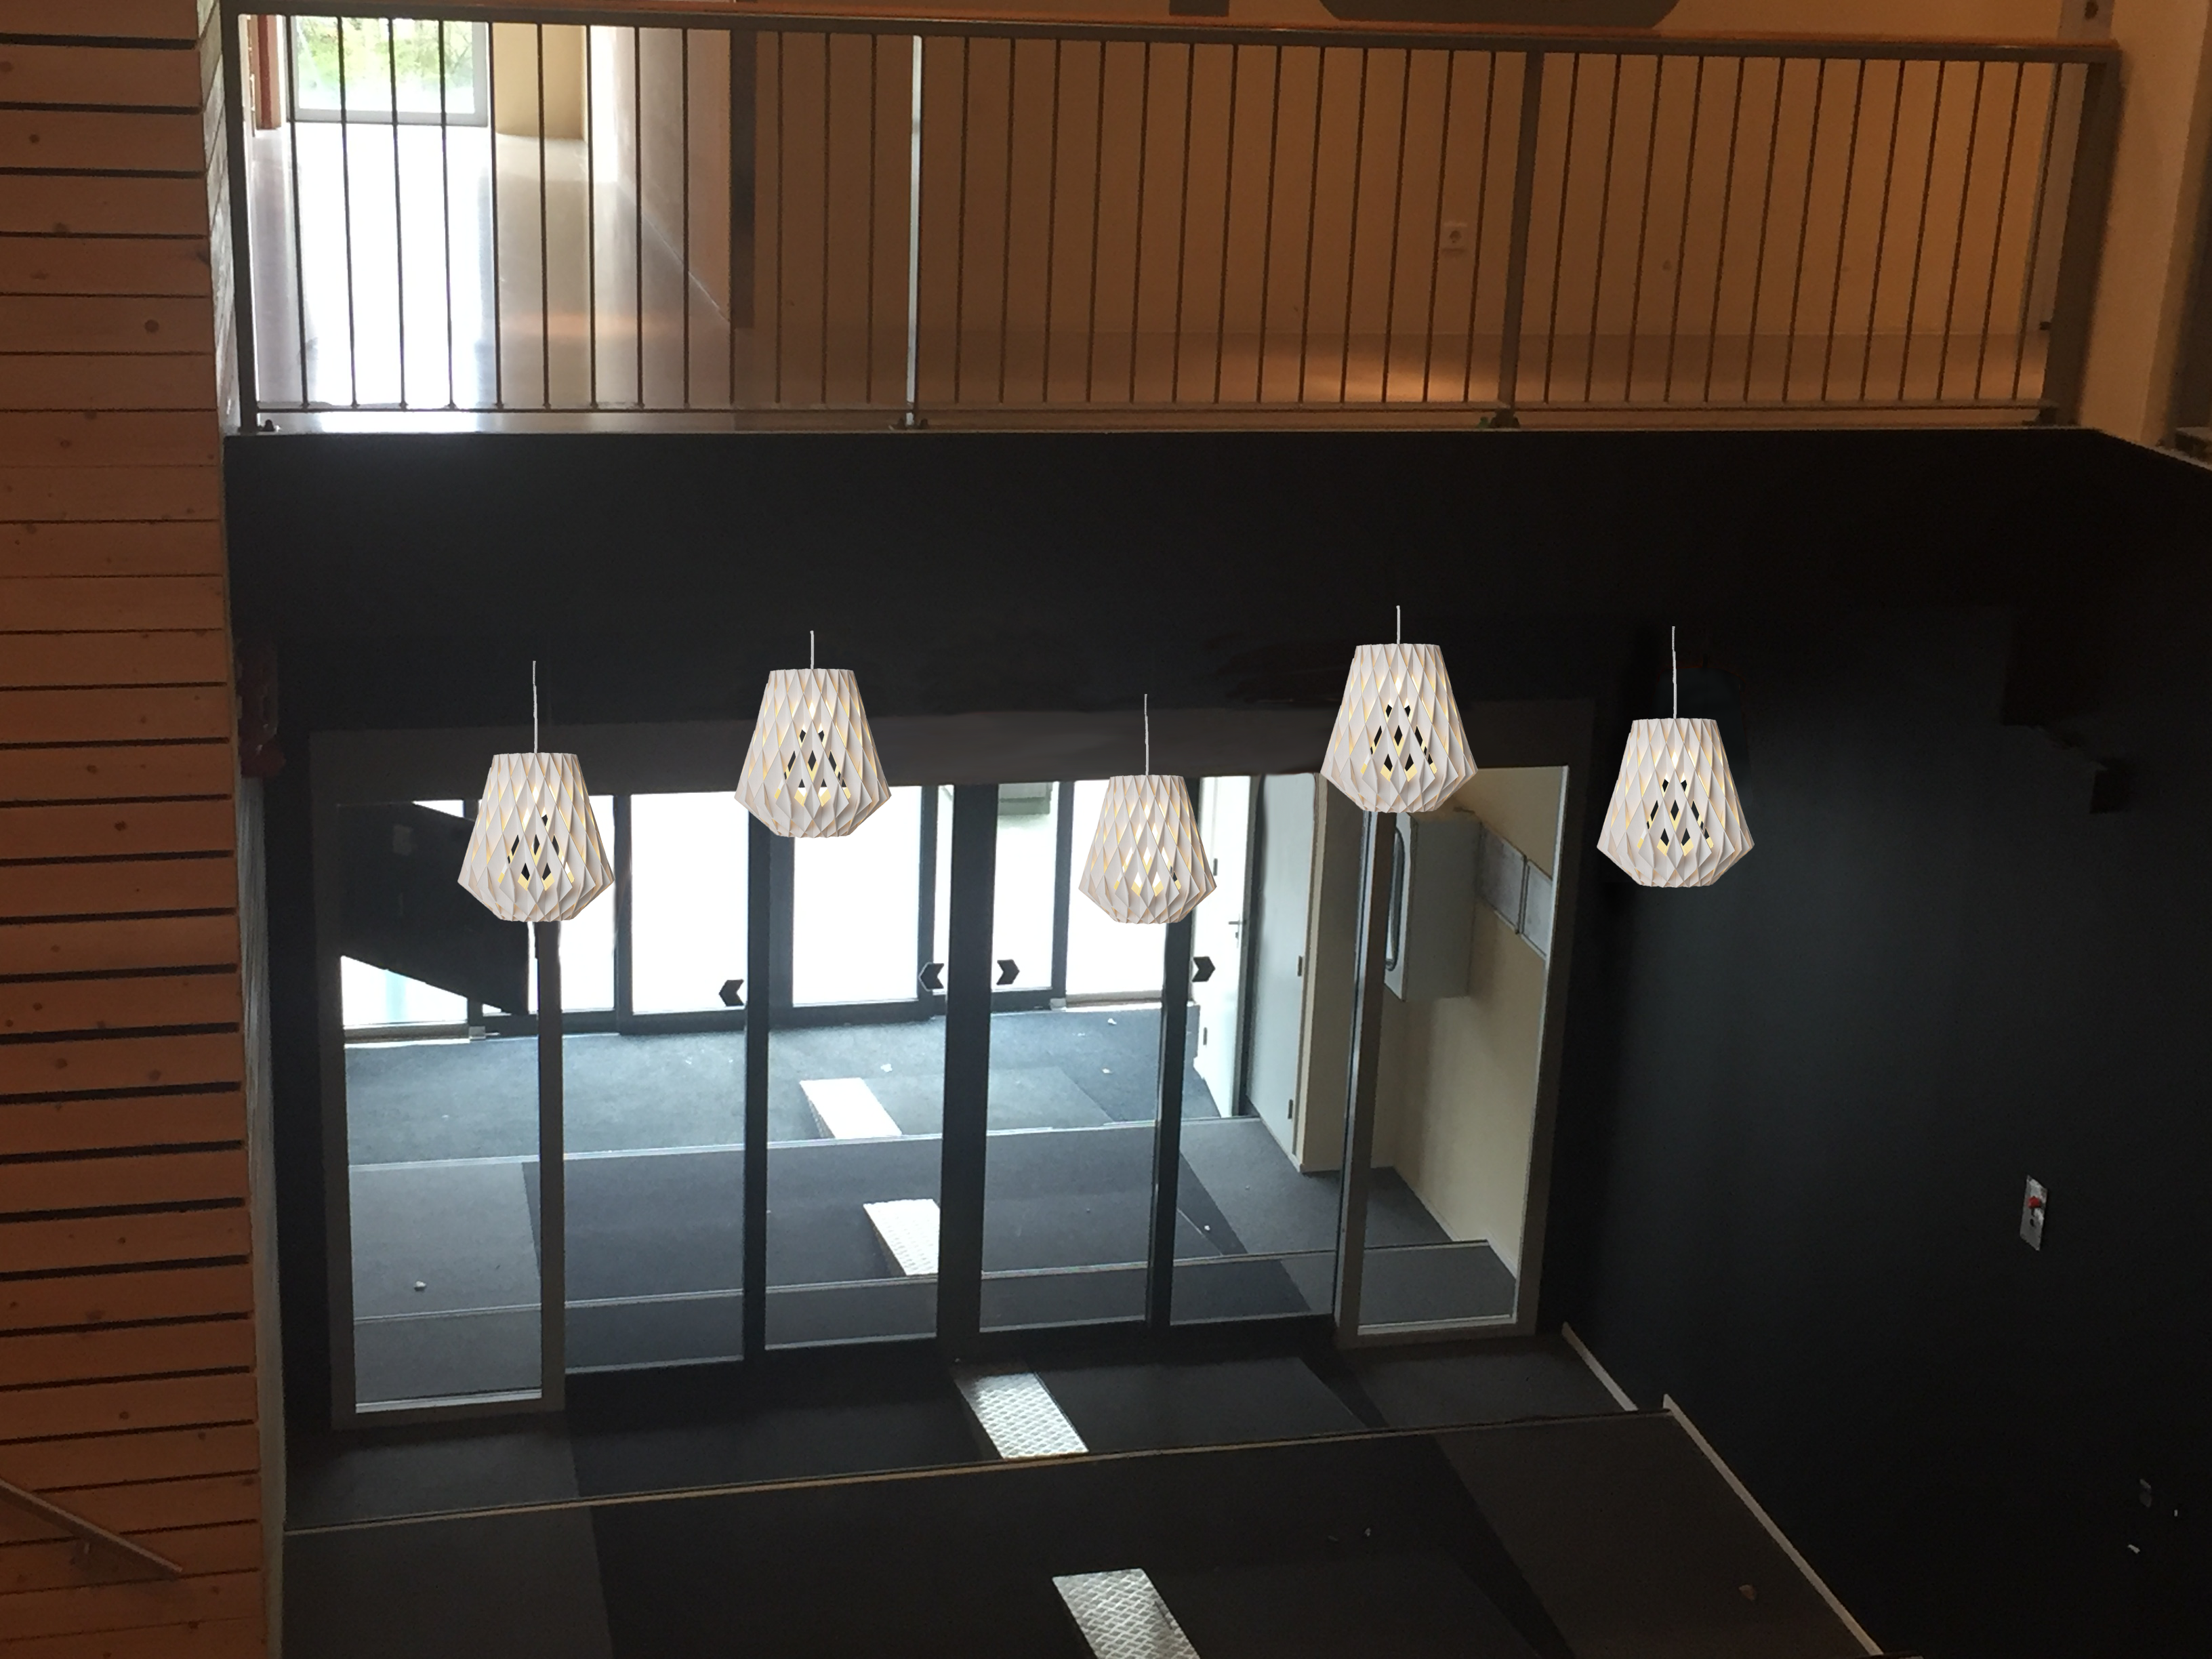 Ijsseldelta Center Zwolle met armatuur Pilke...#sfeerlicht #ledlicht ...